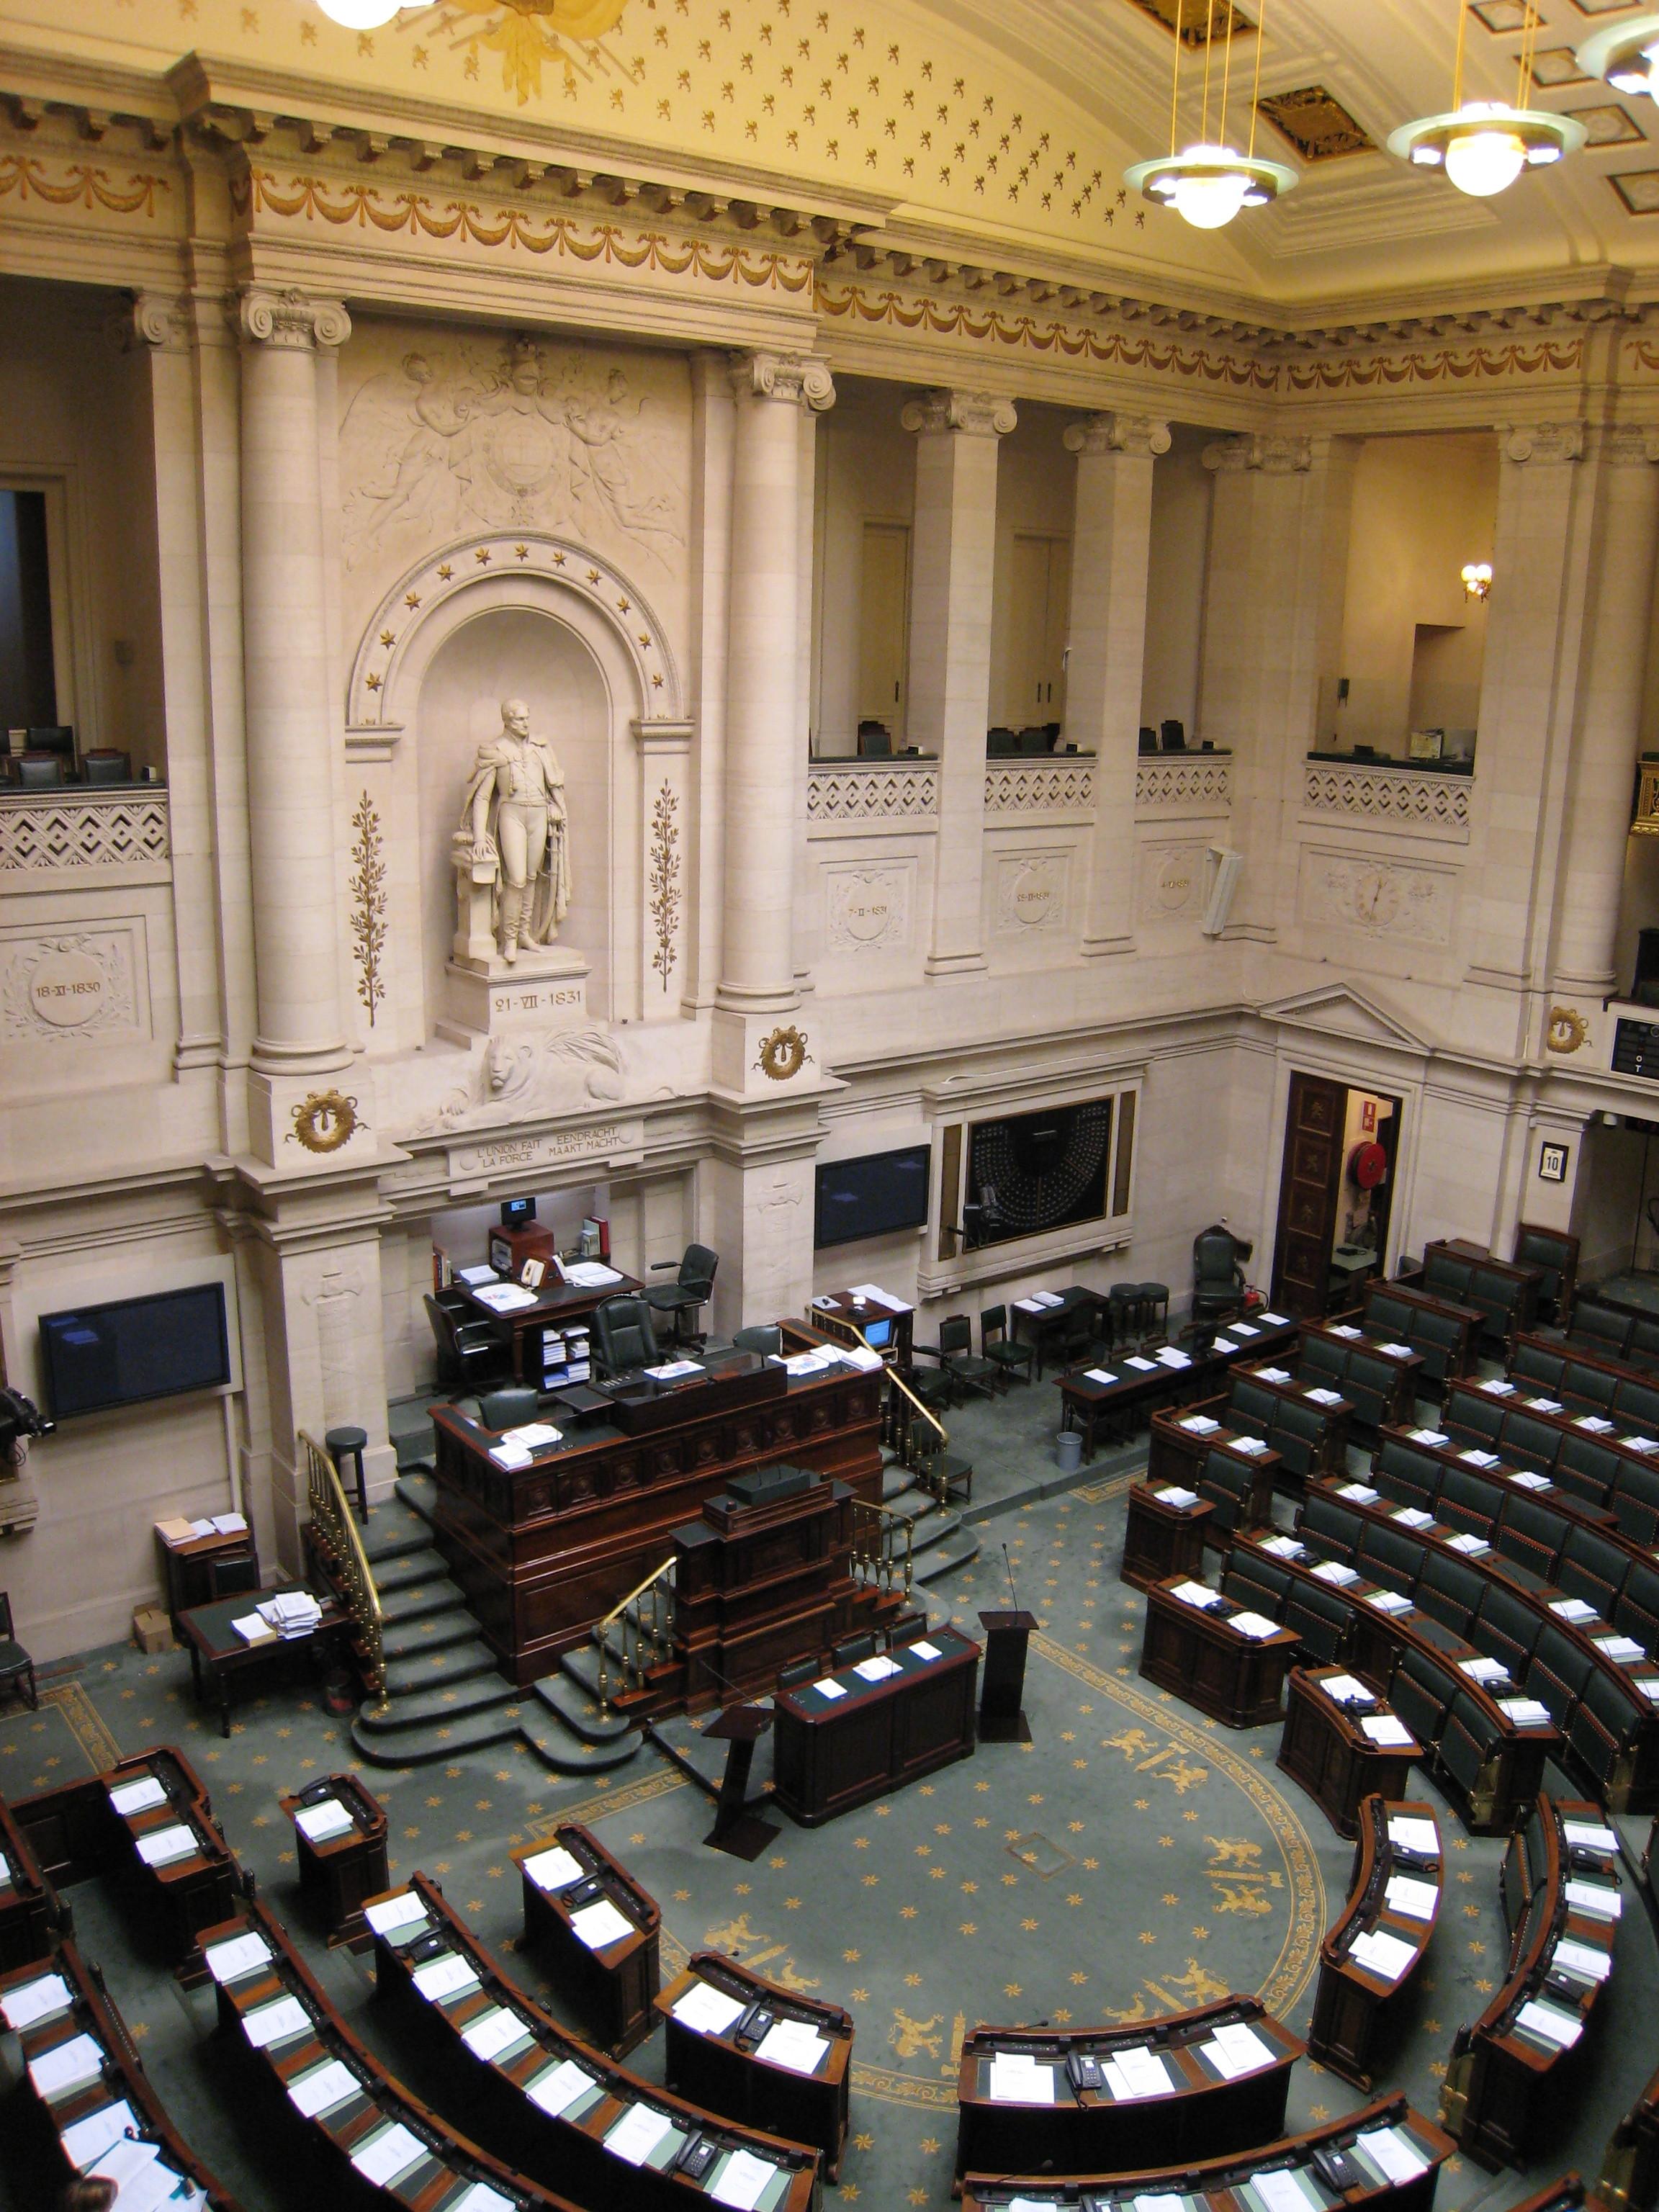 Innenansicht der Abgeordnetenkammer Belgiens. Bild: François Lambregts. Lizenz: Creative Commons BY-SA 2.0.